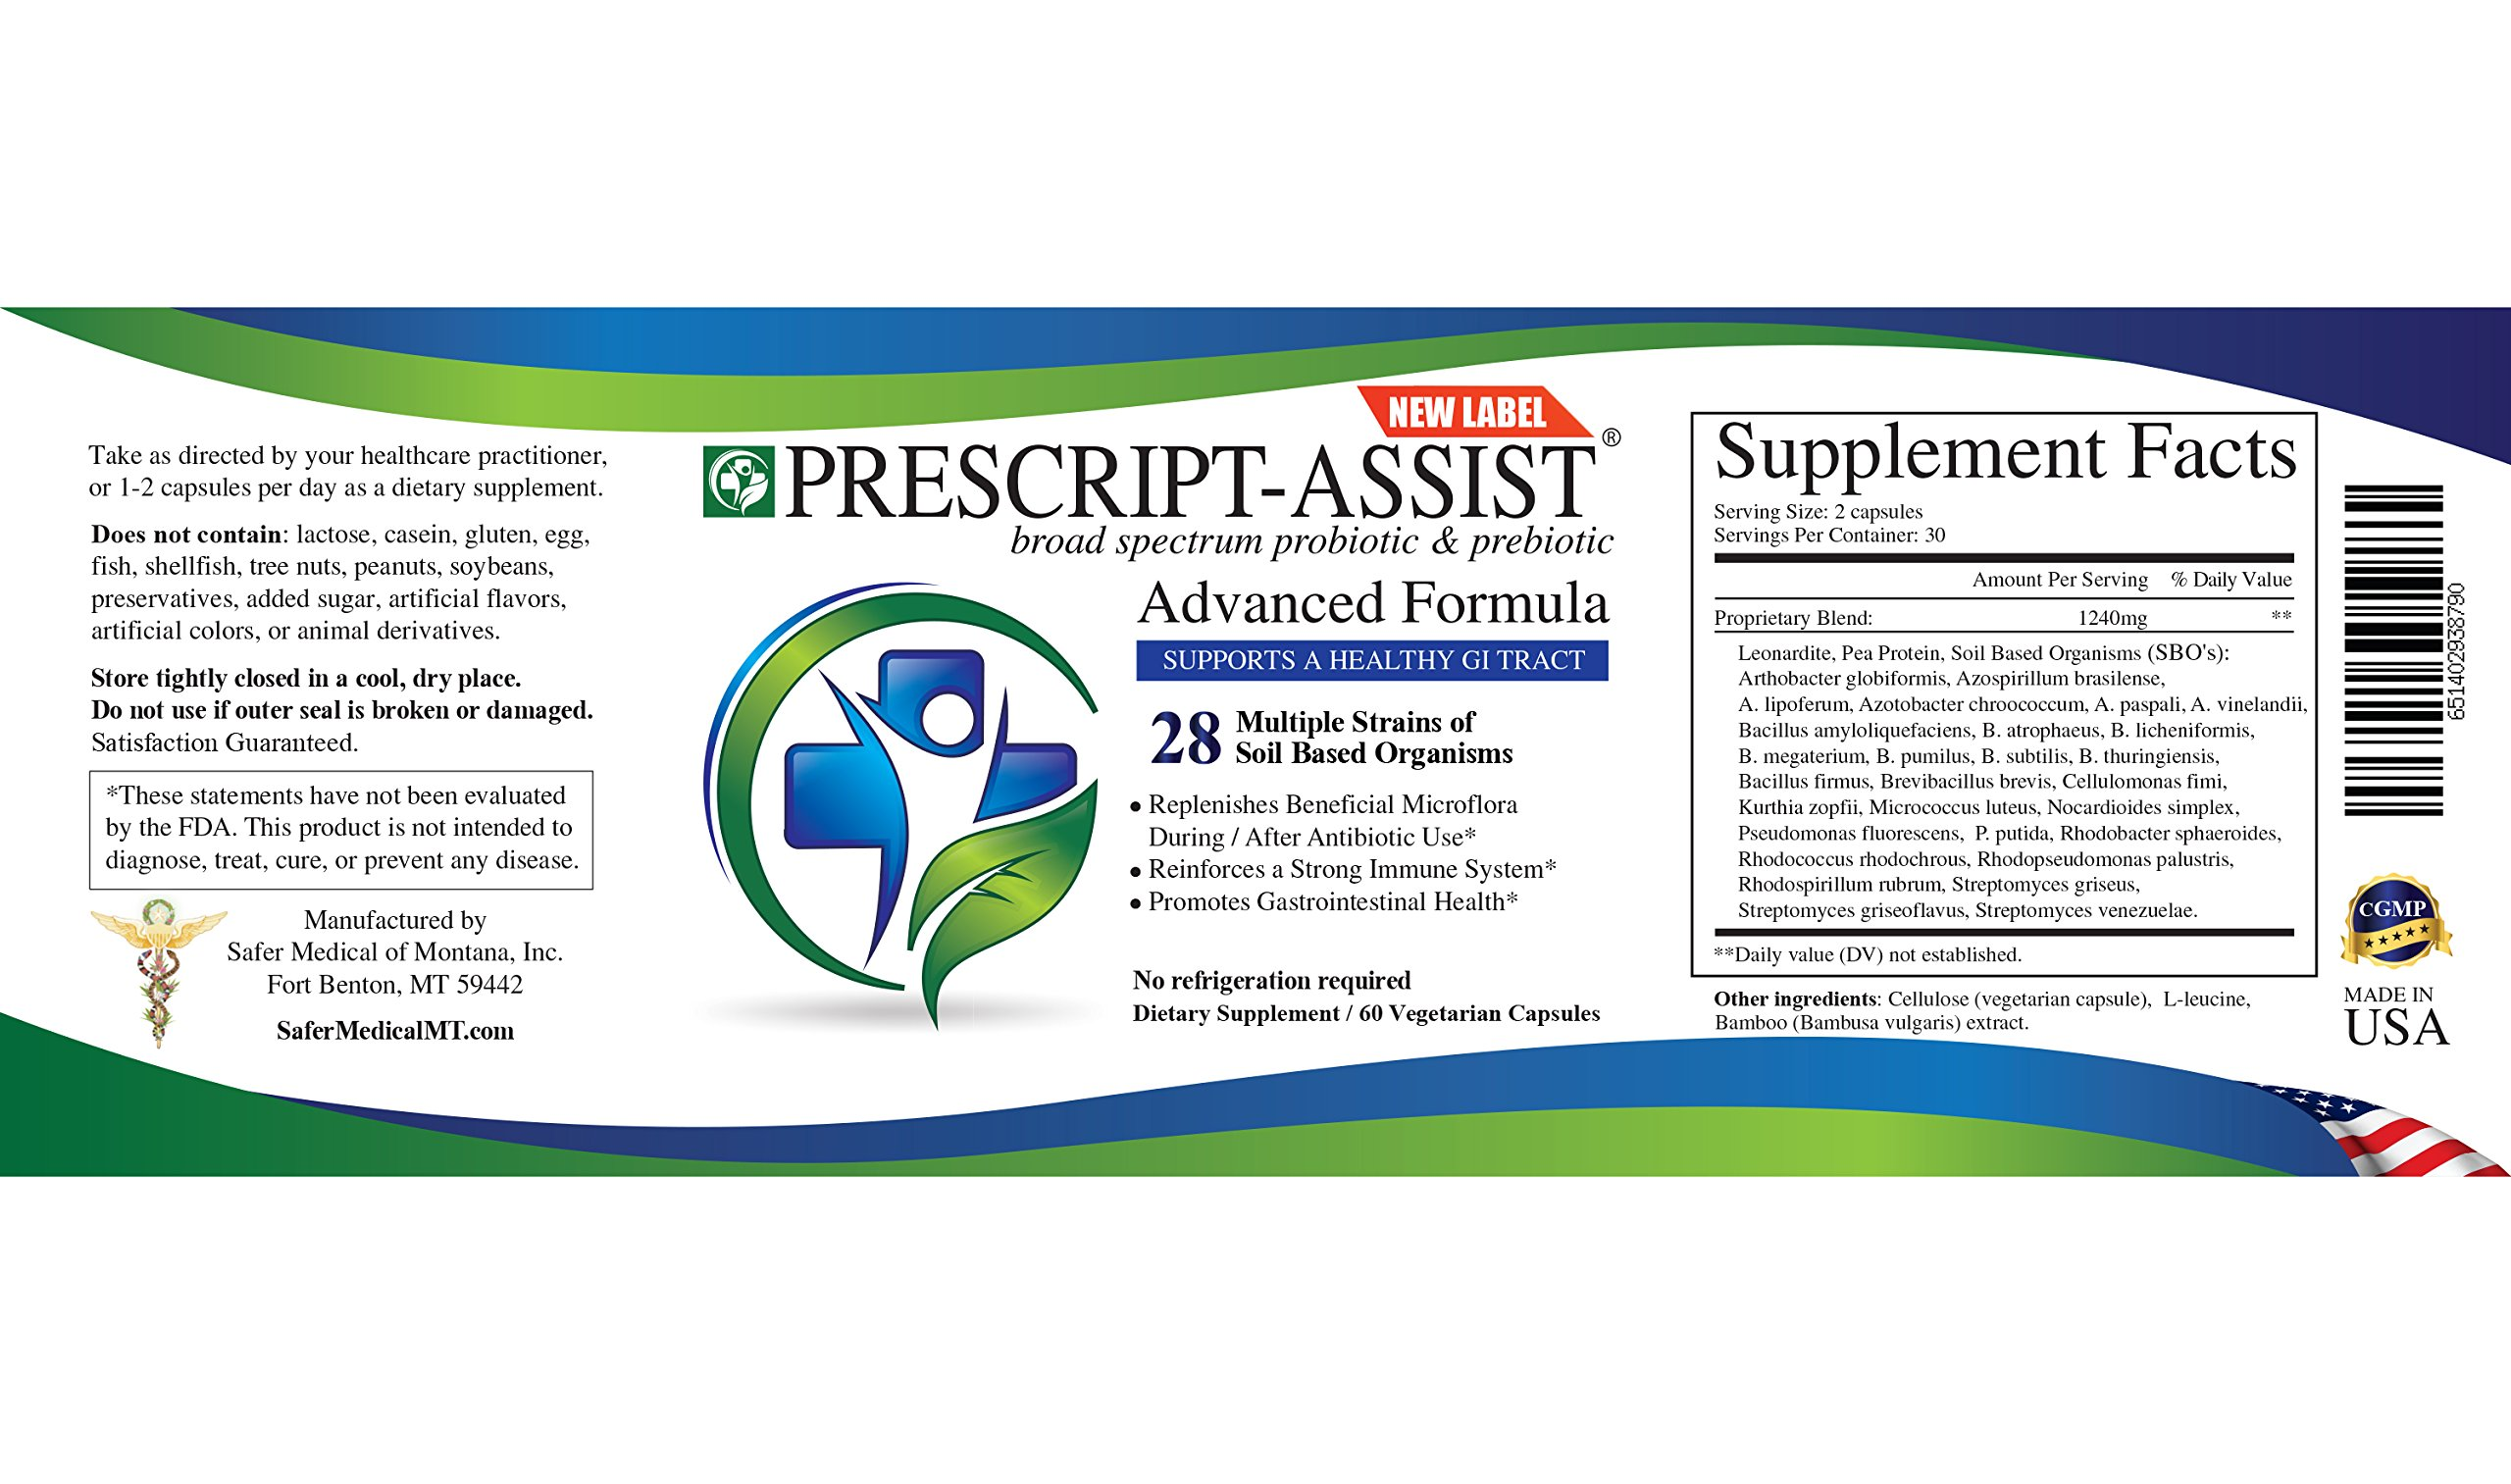 Prescript-assist Broad Spectrum soil based Probiotic Prebiotic supplements 60 Capsules X 2 (pea protein added)... by Prescript-Assist (Image #2)